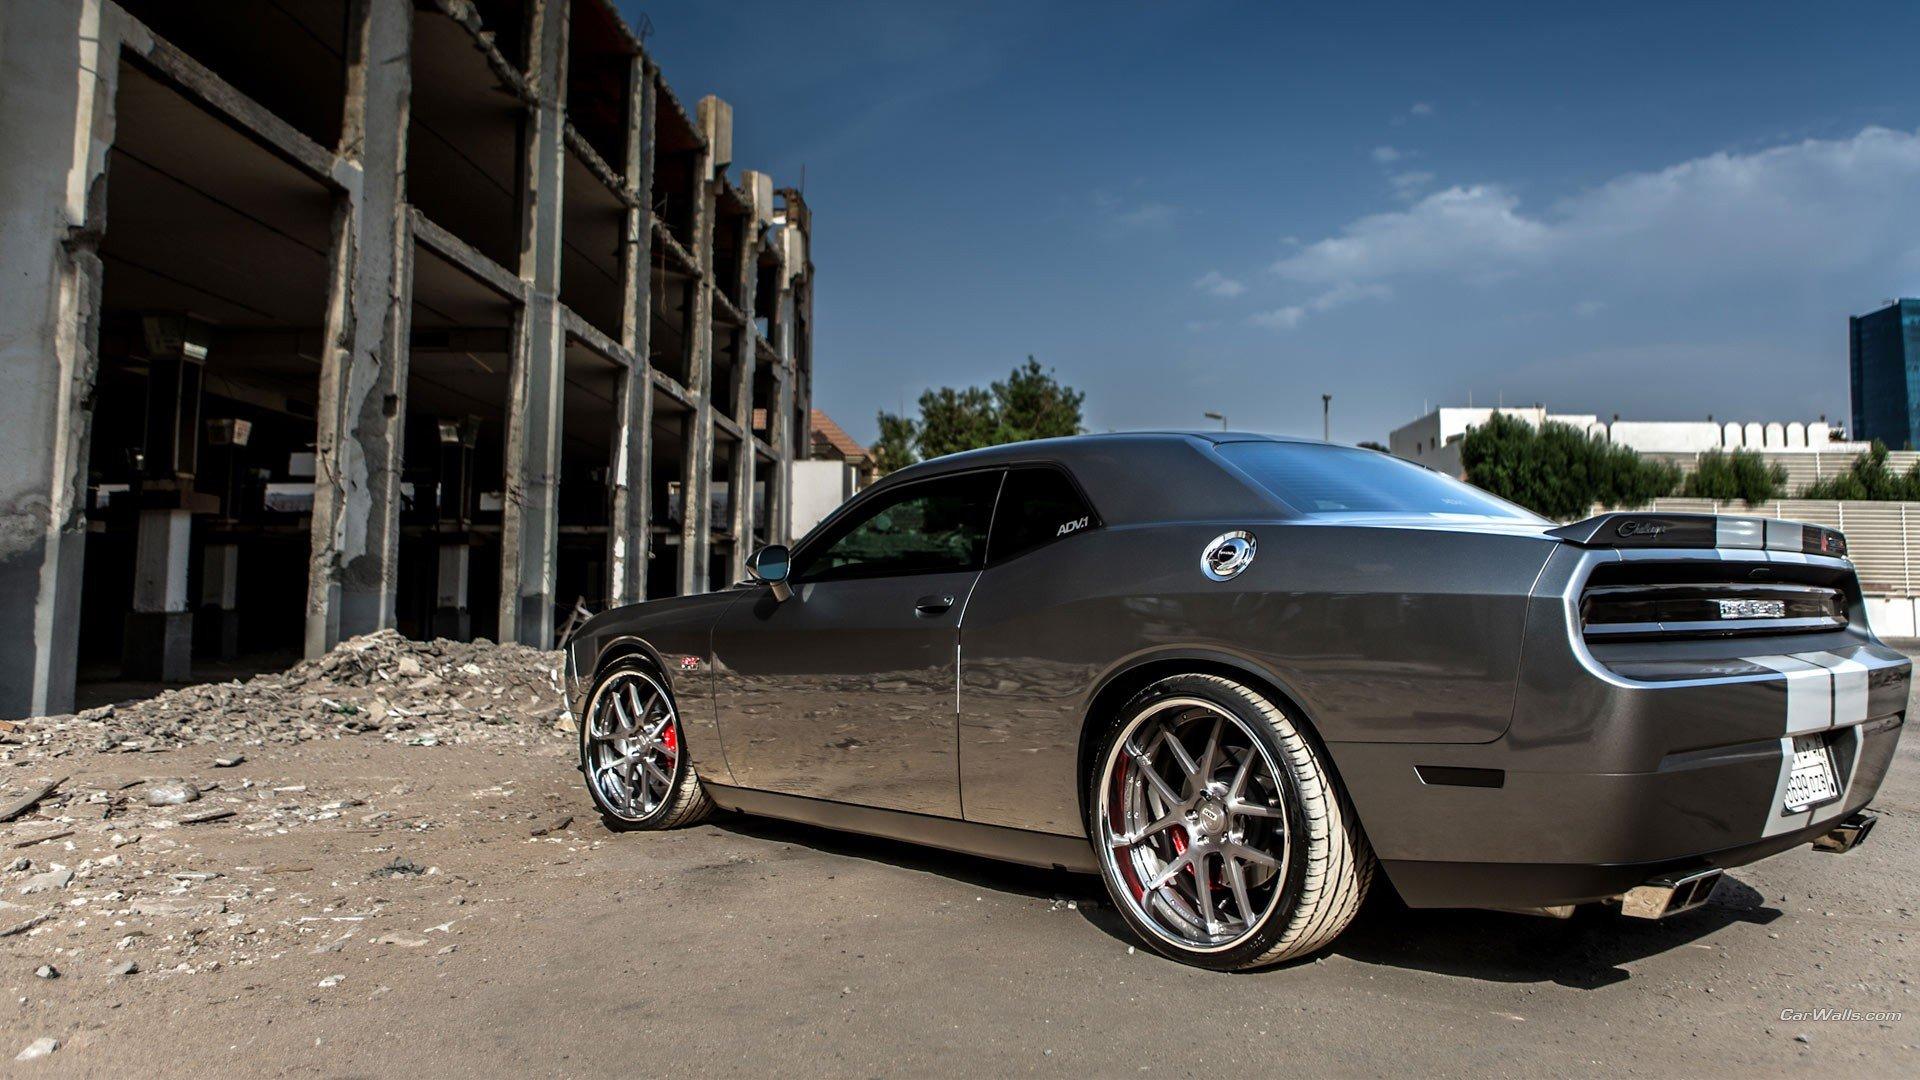 Cars Dodge Dodge Challenger Dodge Challenger Wheels